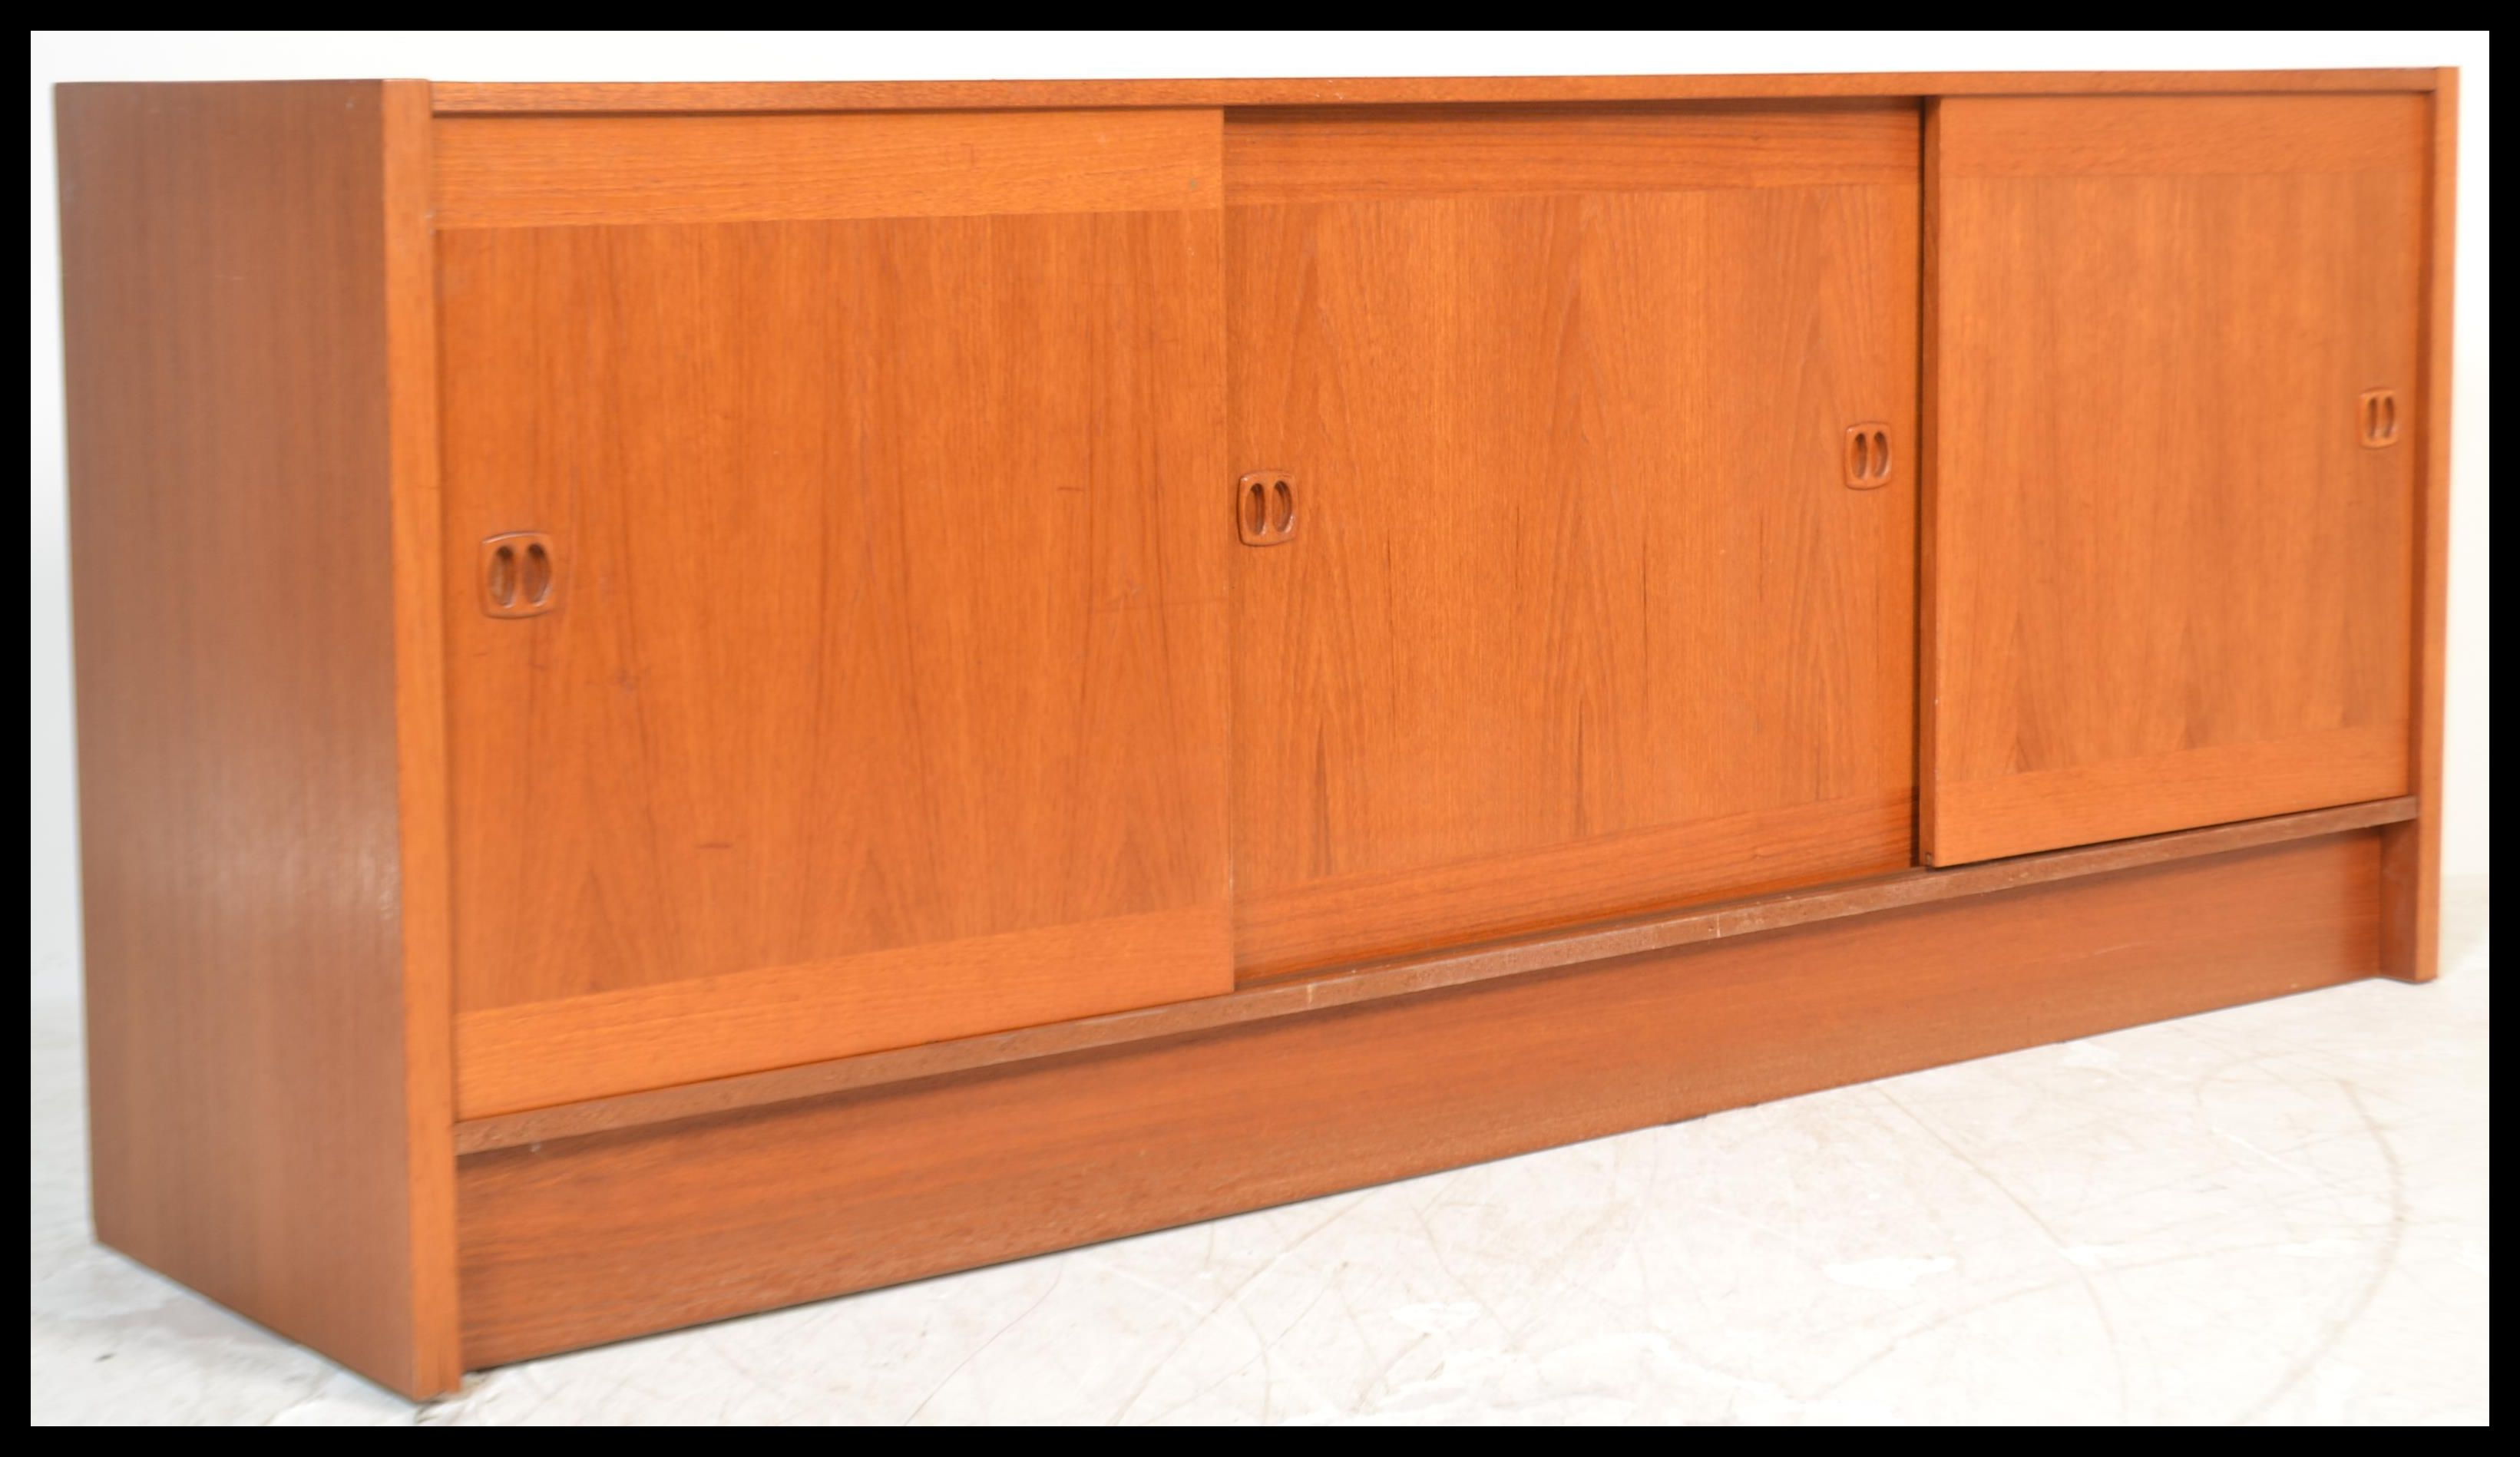 Danish Teak Credenza For Sale : A vintage th century danish teak wood sideboard credenza by